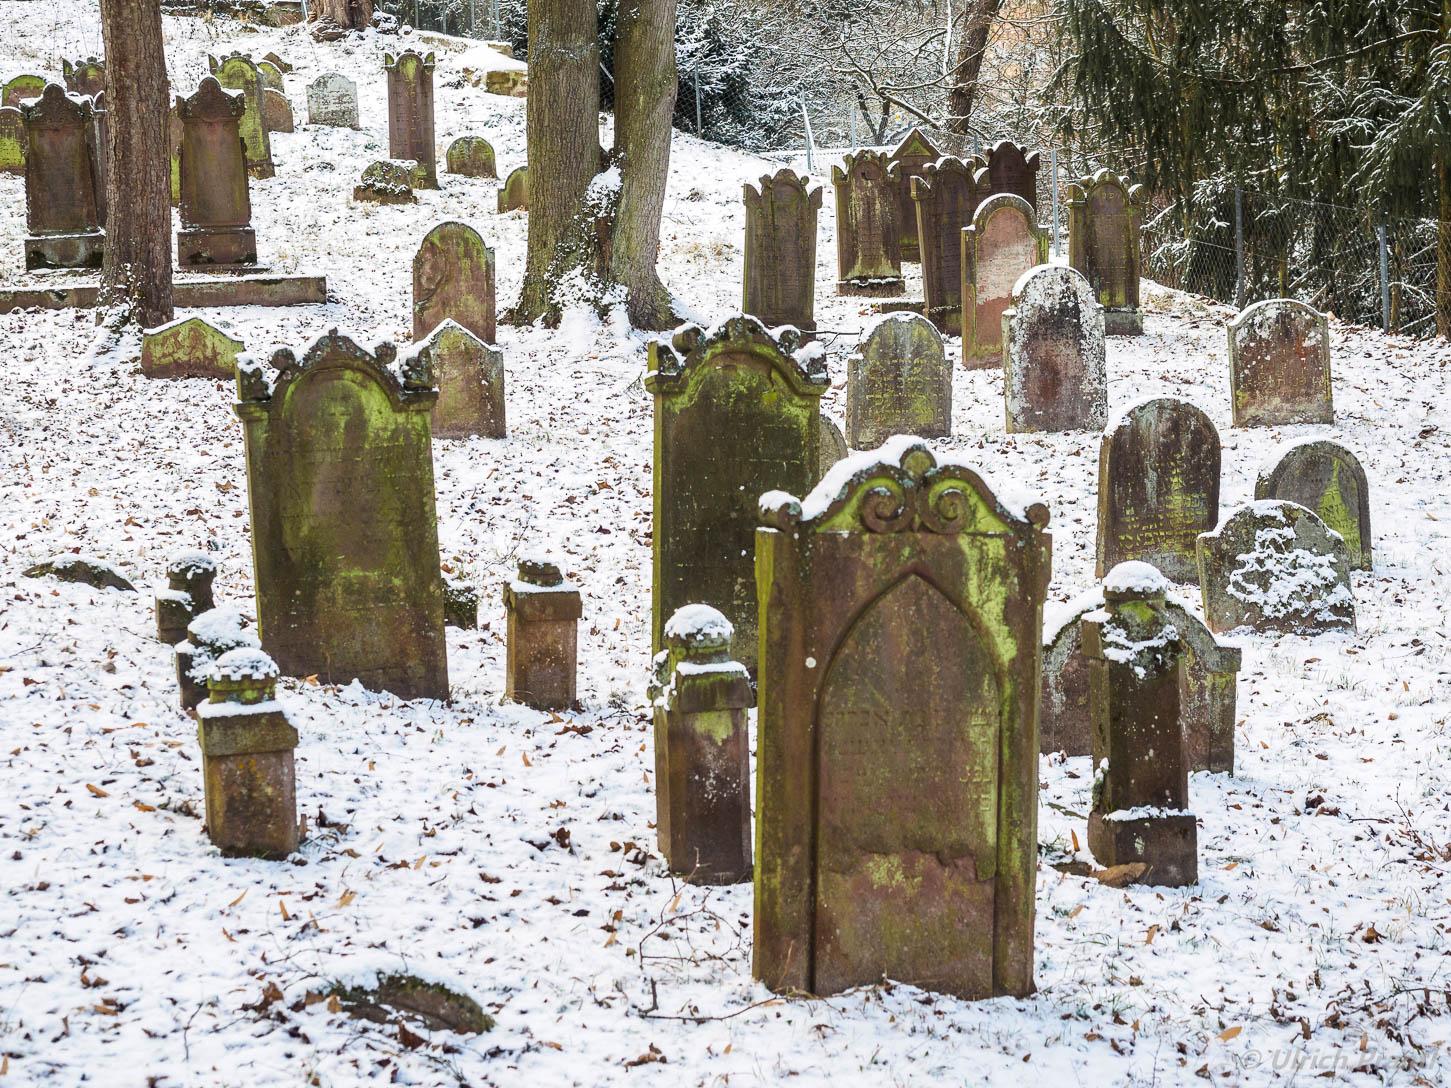 Jüdischer Friedhof, Miltenberg, Winter